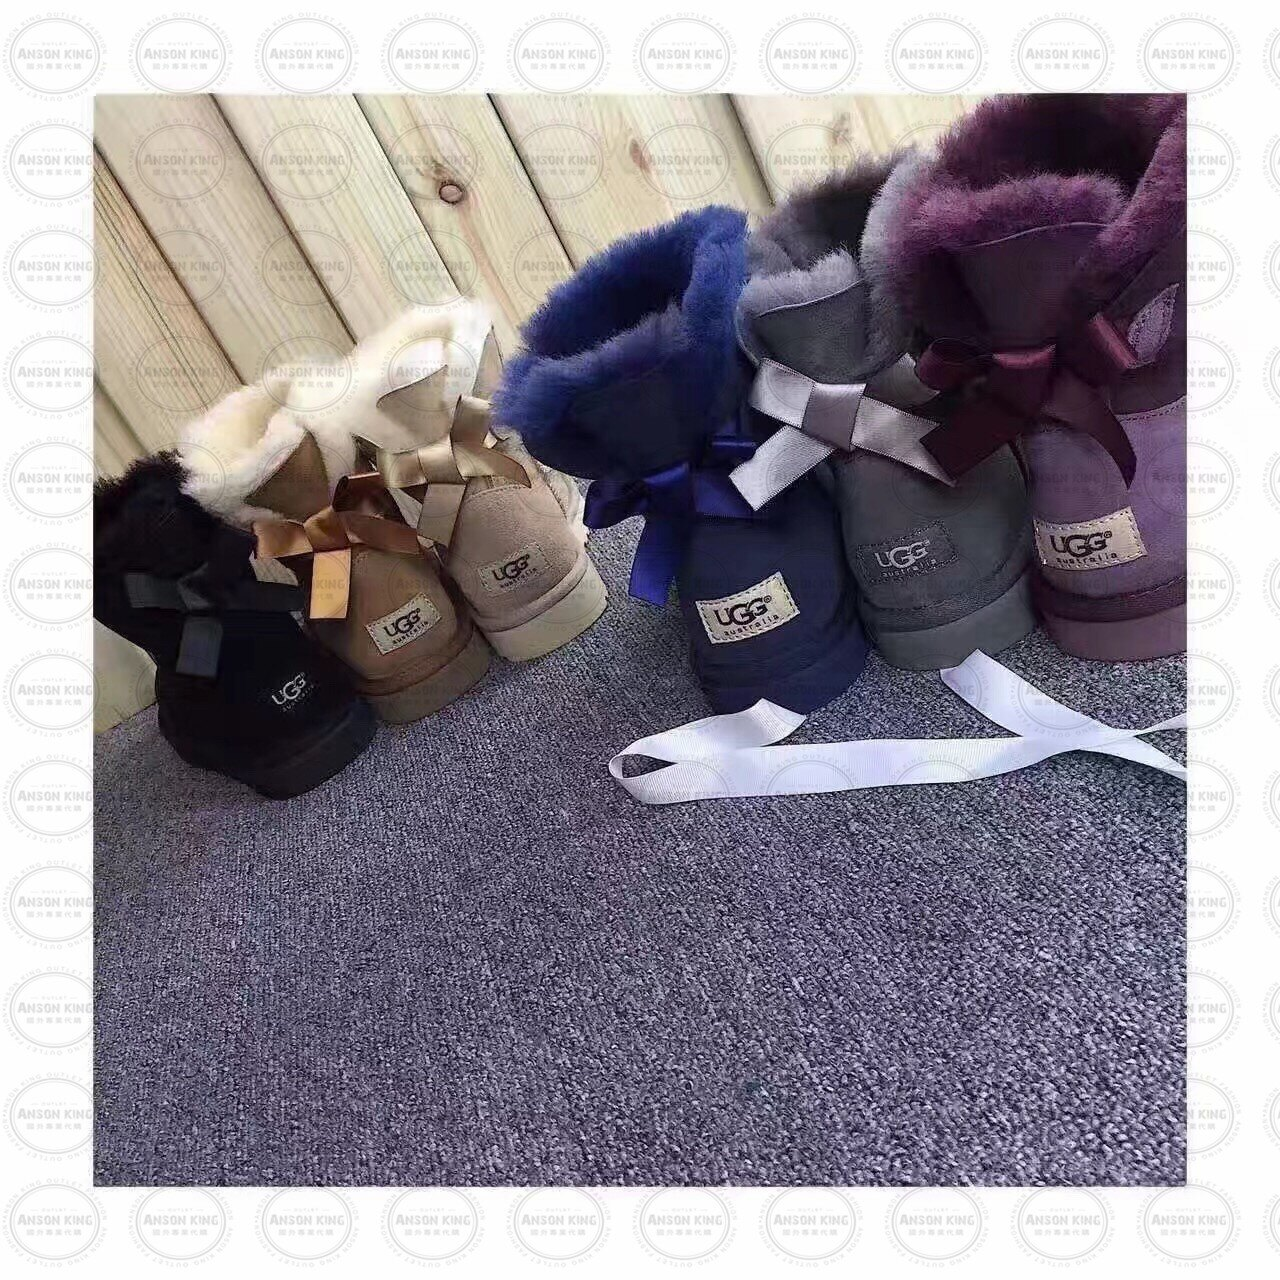 OUTLET正品代購 澳洲 UGG 單蝴蝶結羊皮毛一體 中長靴 保暖 真皮羊皮毛 雪靴 短靴 摩卡色 1